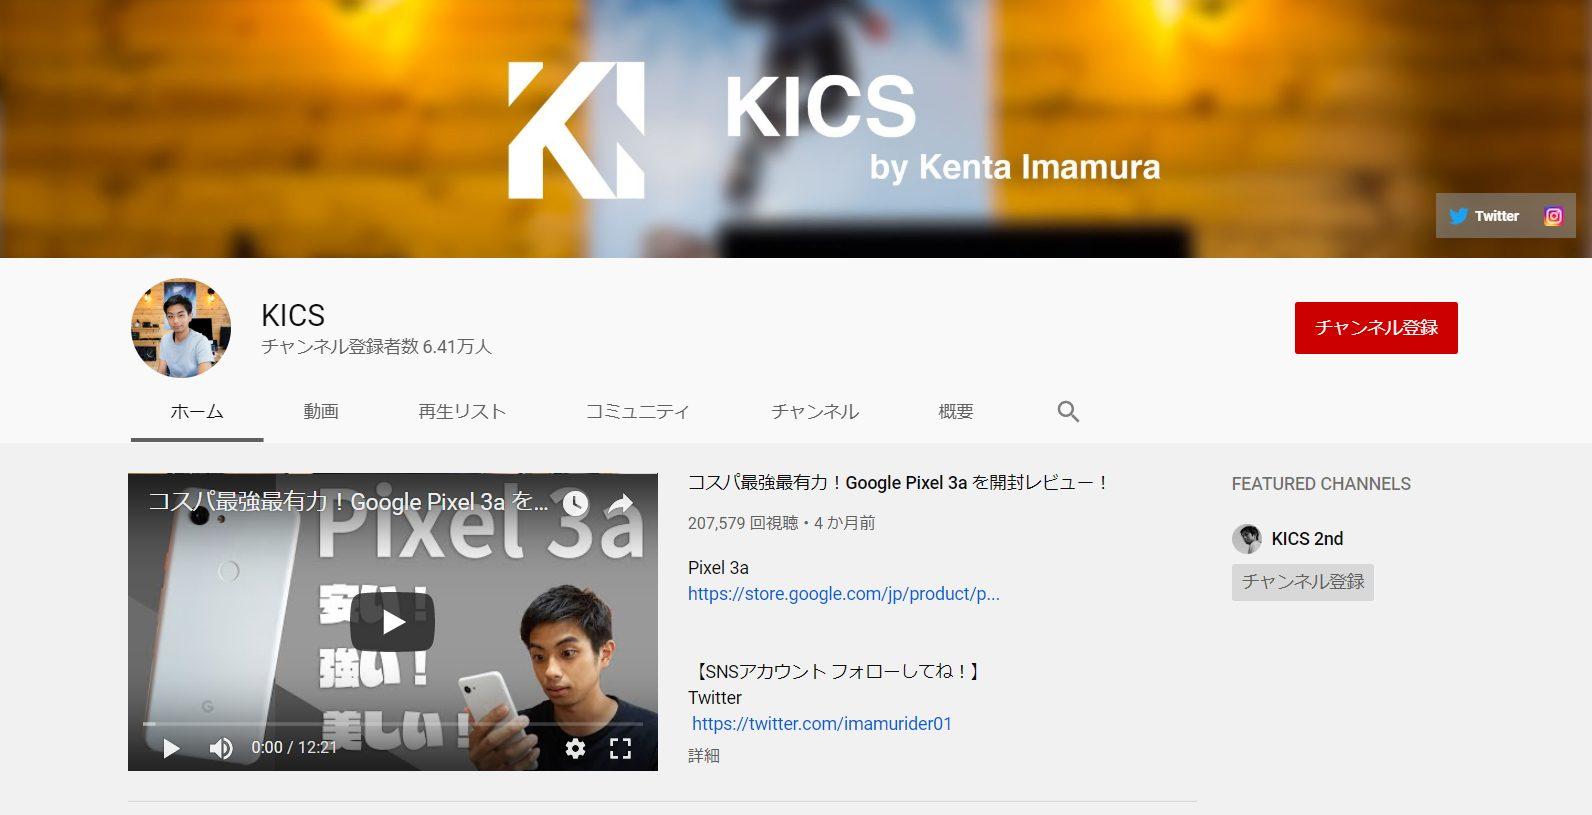 gadget-influencer-kicks-kenta-imamura